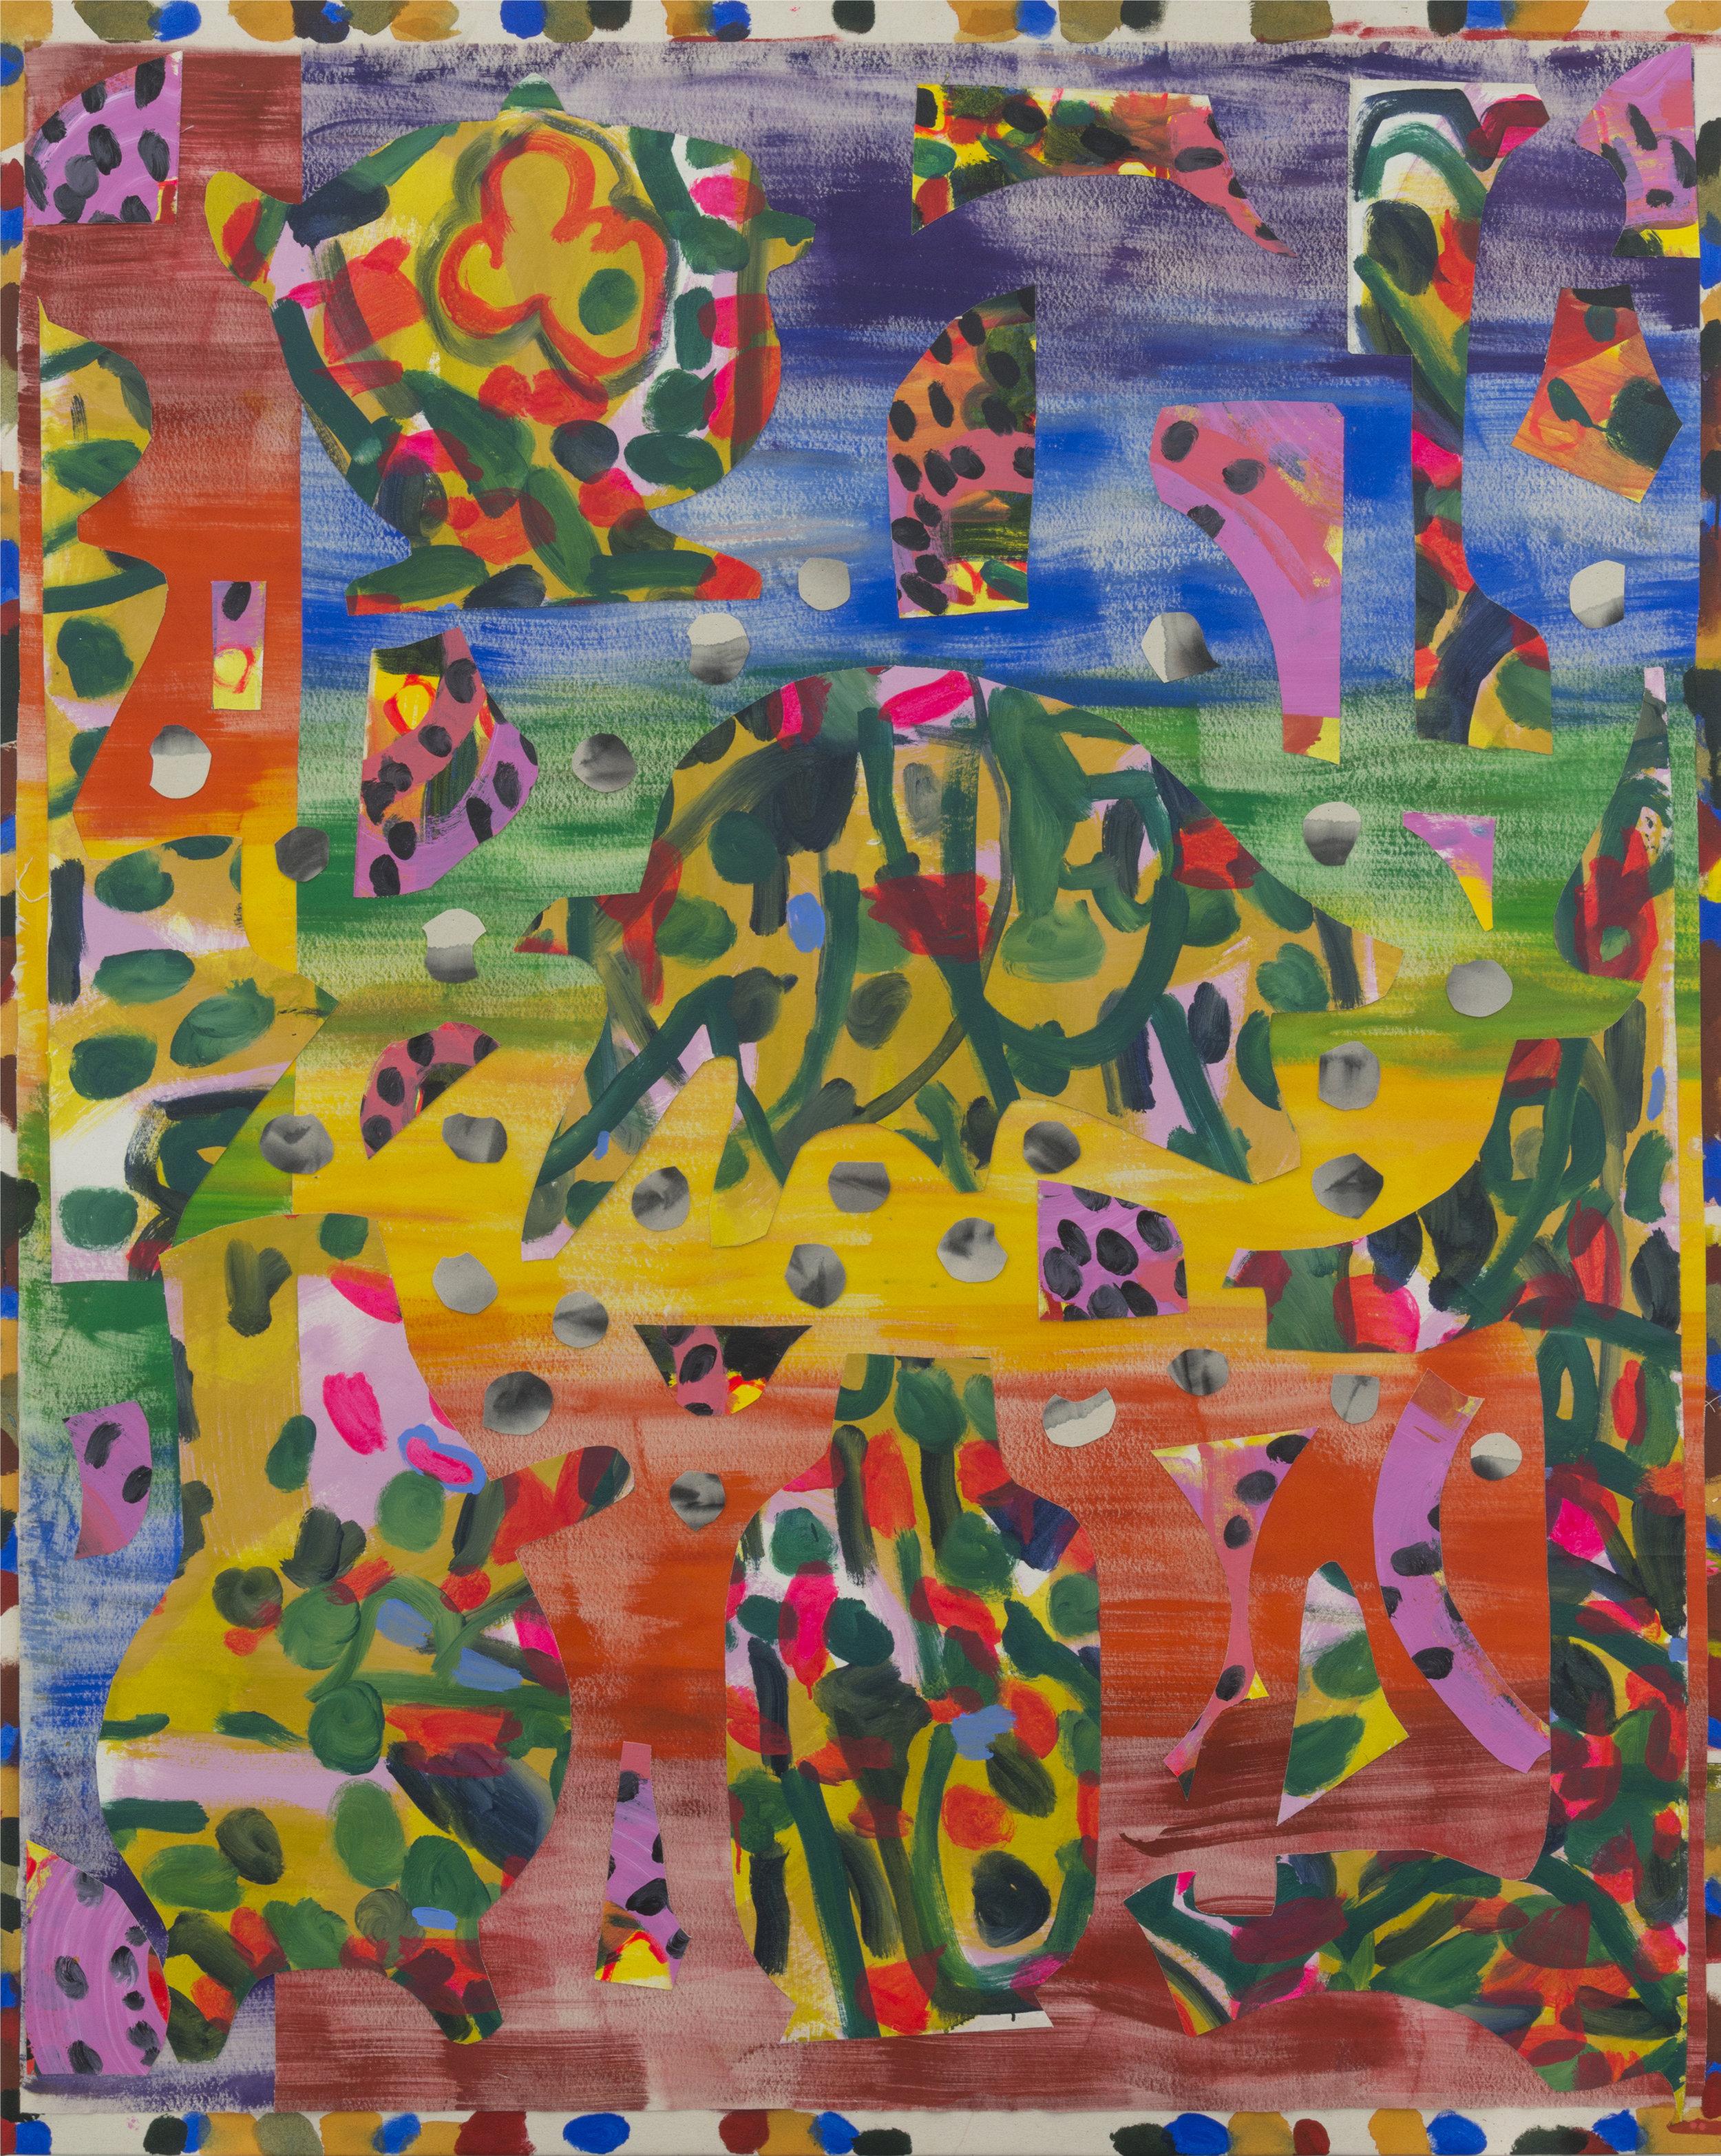 June 3, 2016 / Acrylic, Glue, Canvas